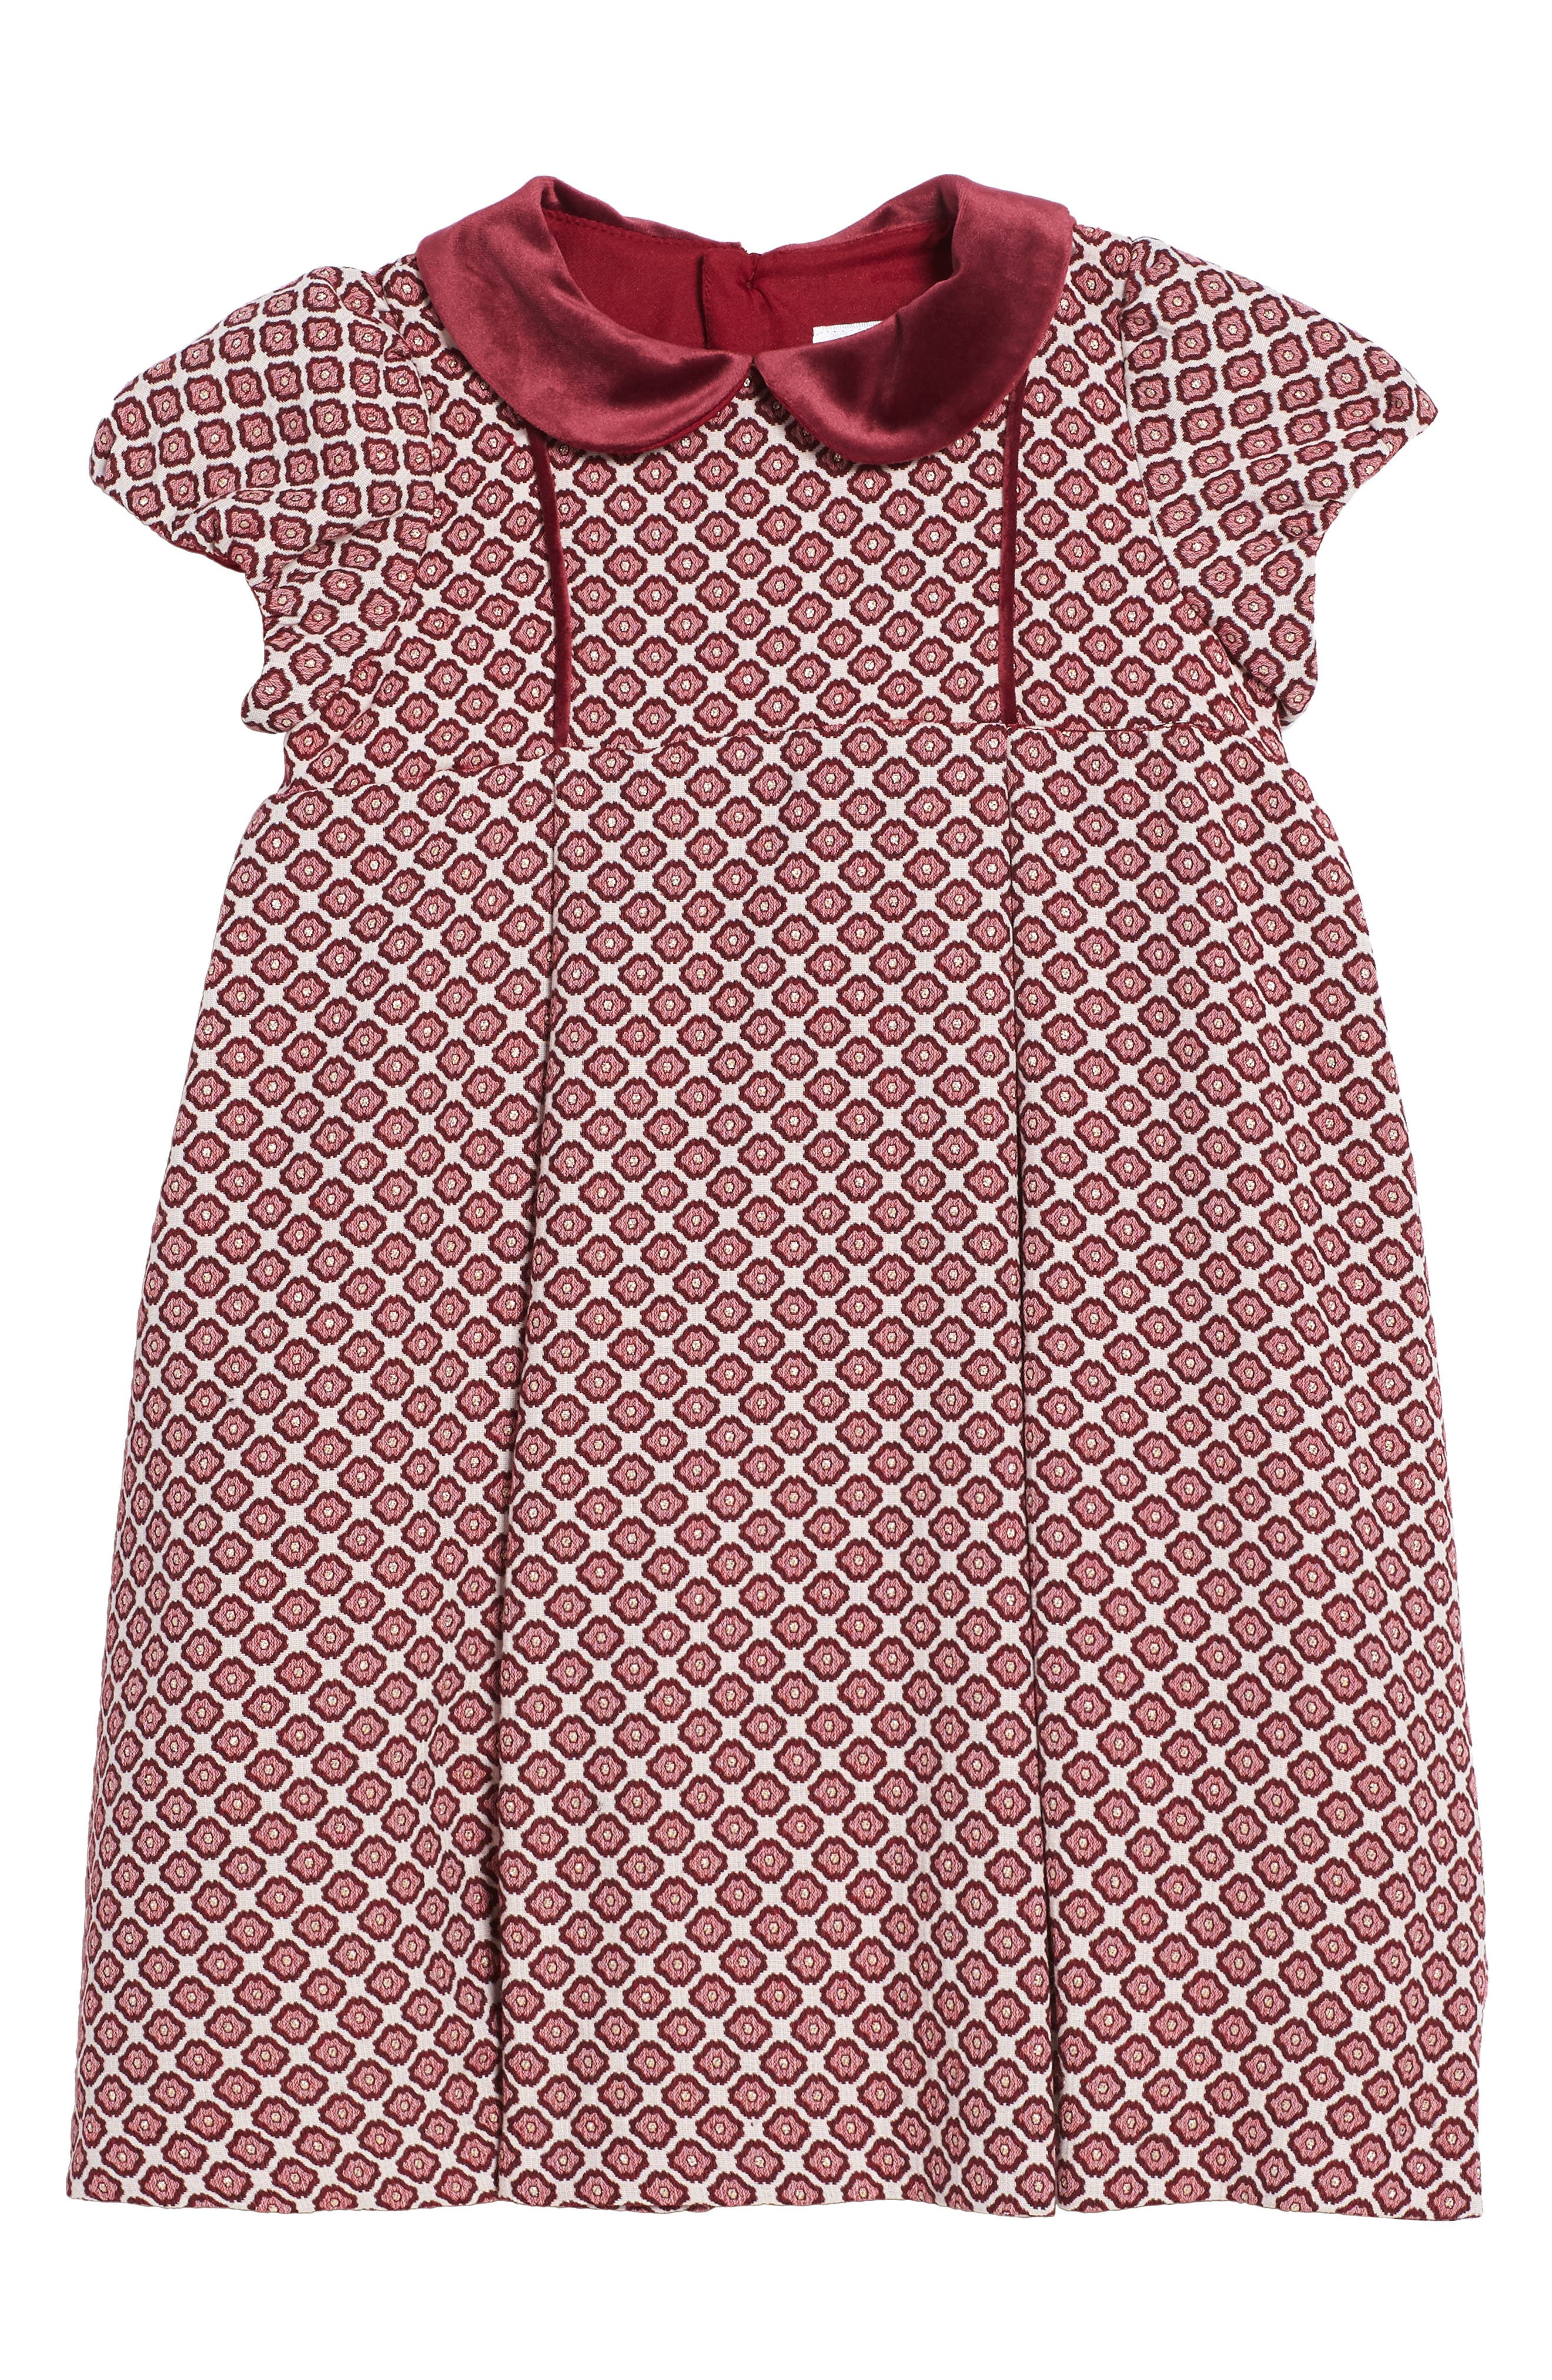 Floral Jacquard Dress,                             Main thumbnail 1, color,                             Burgundy